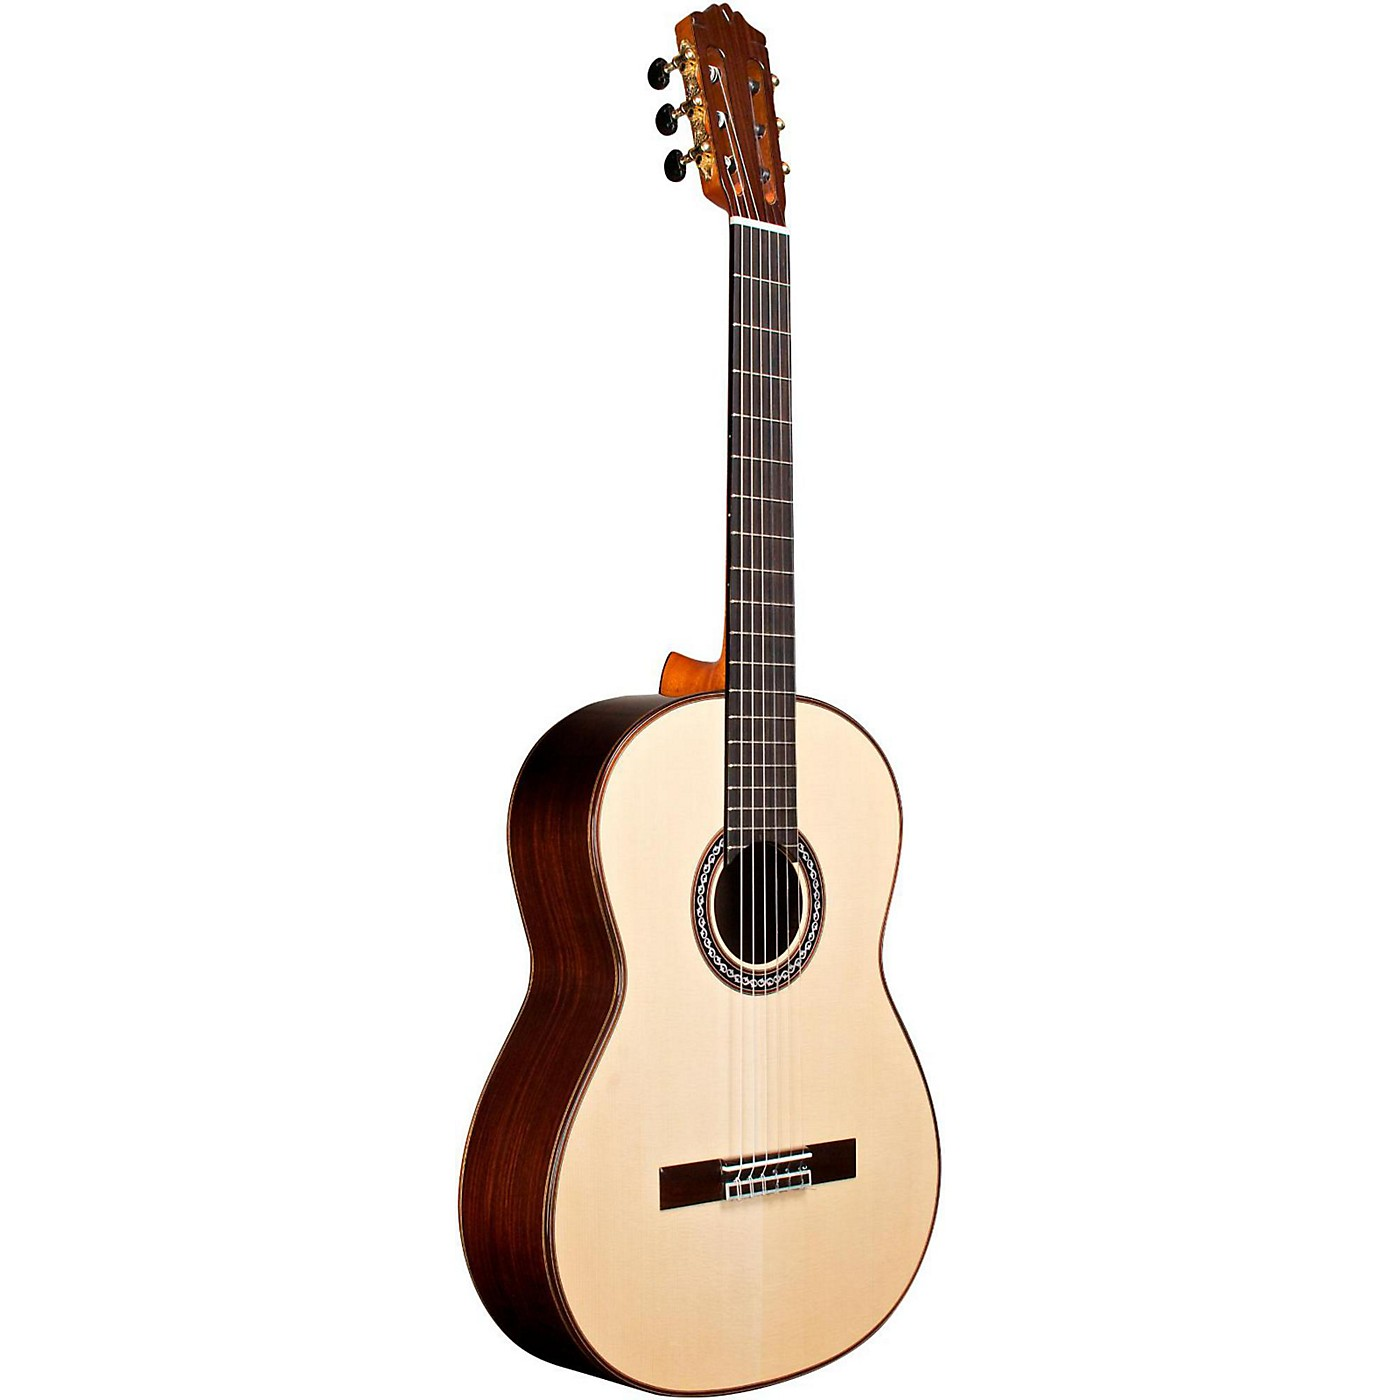 Cordoba C10 SP/IN Acoustic Nylon String Classical Guitar thumbnail